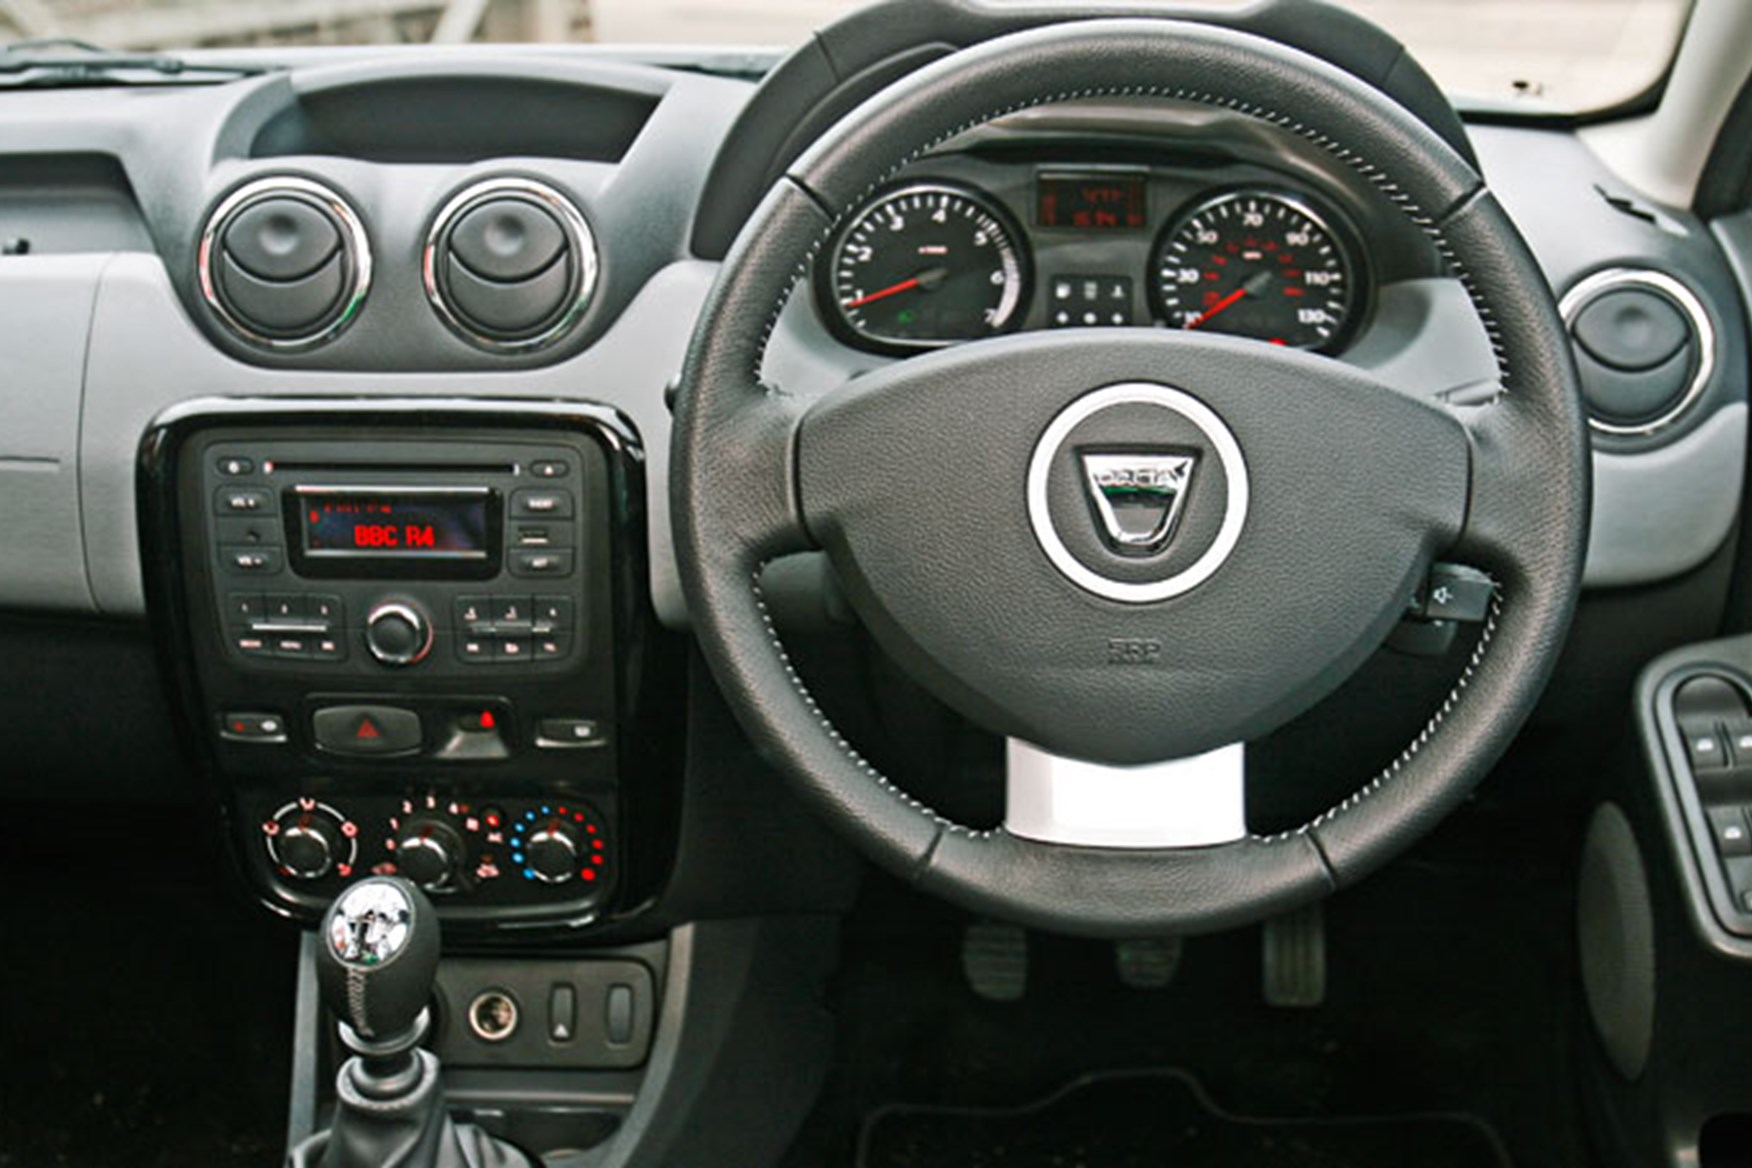 Renault duster 1.5d